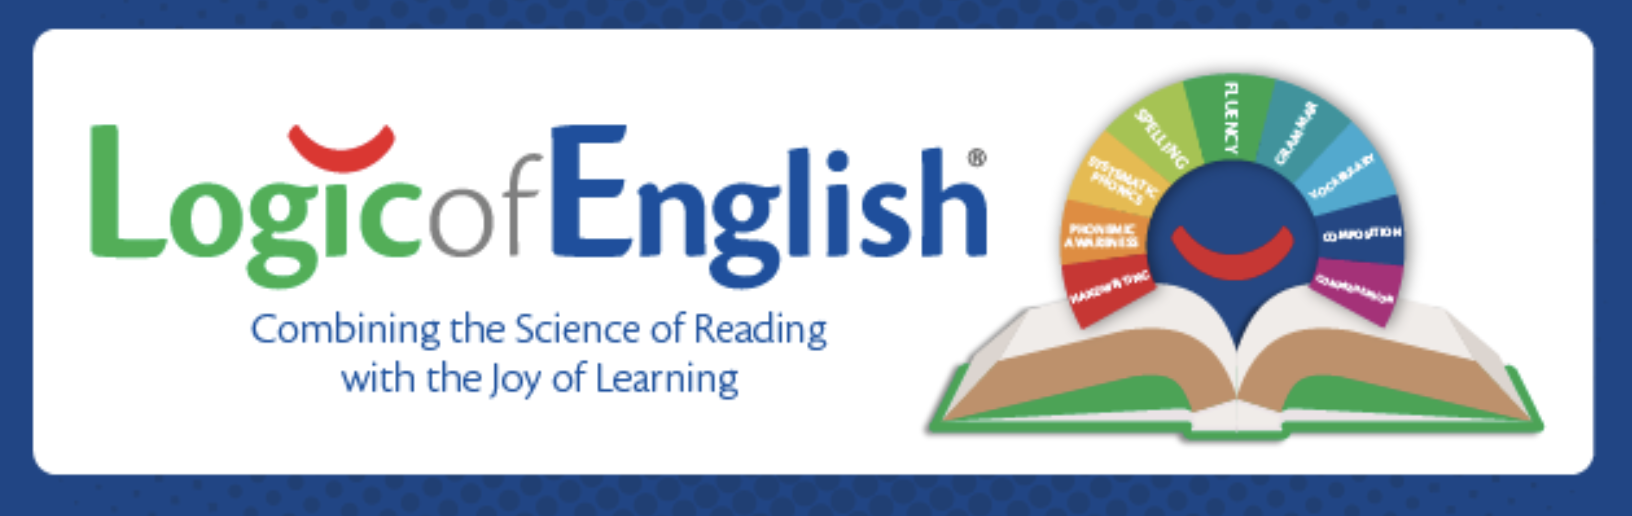 Logic of English Online for 4th grade language arts curriculum